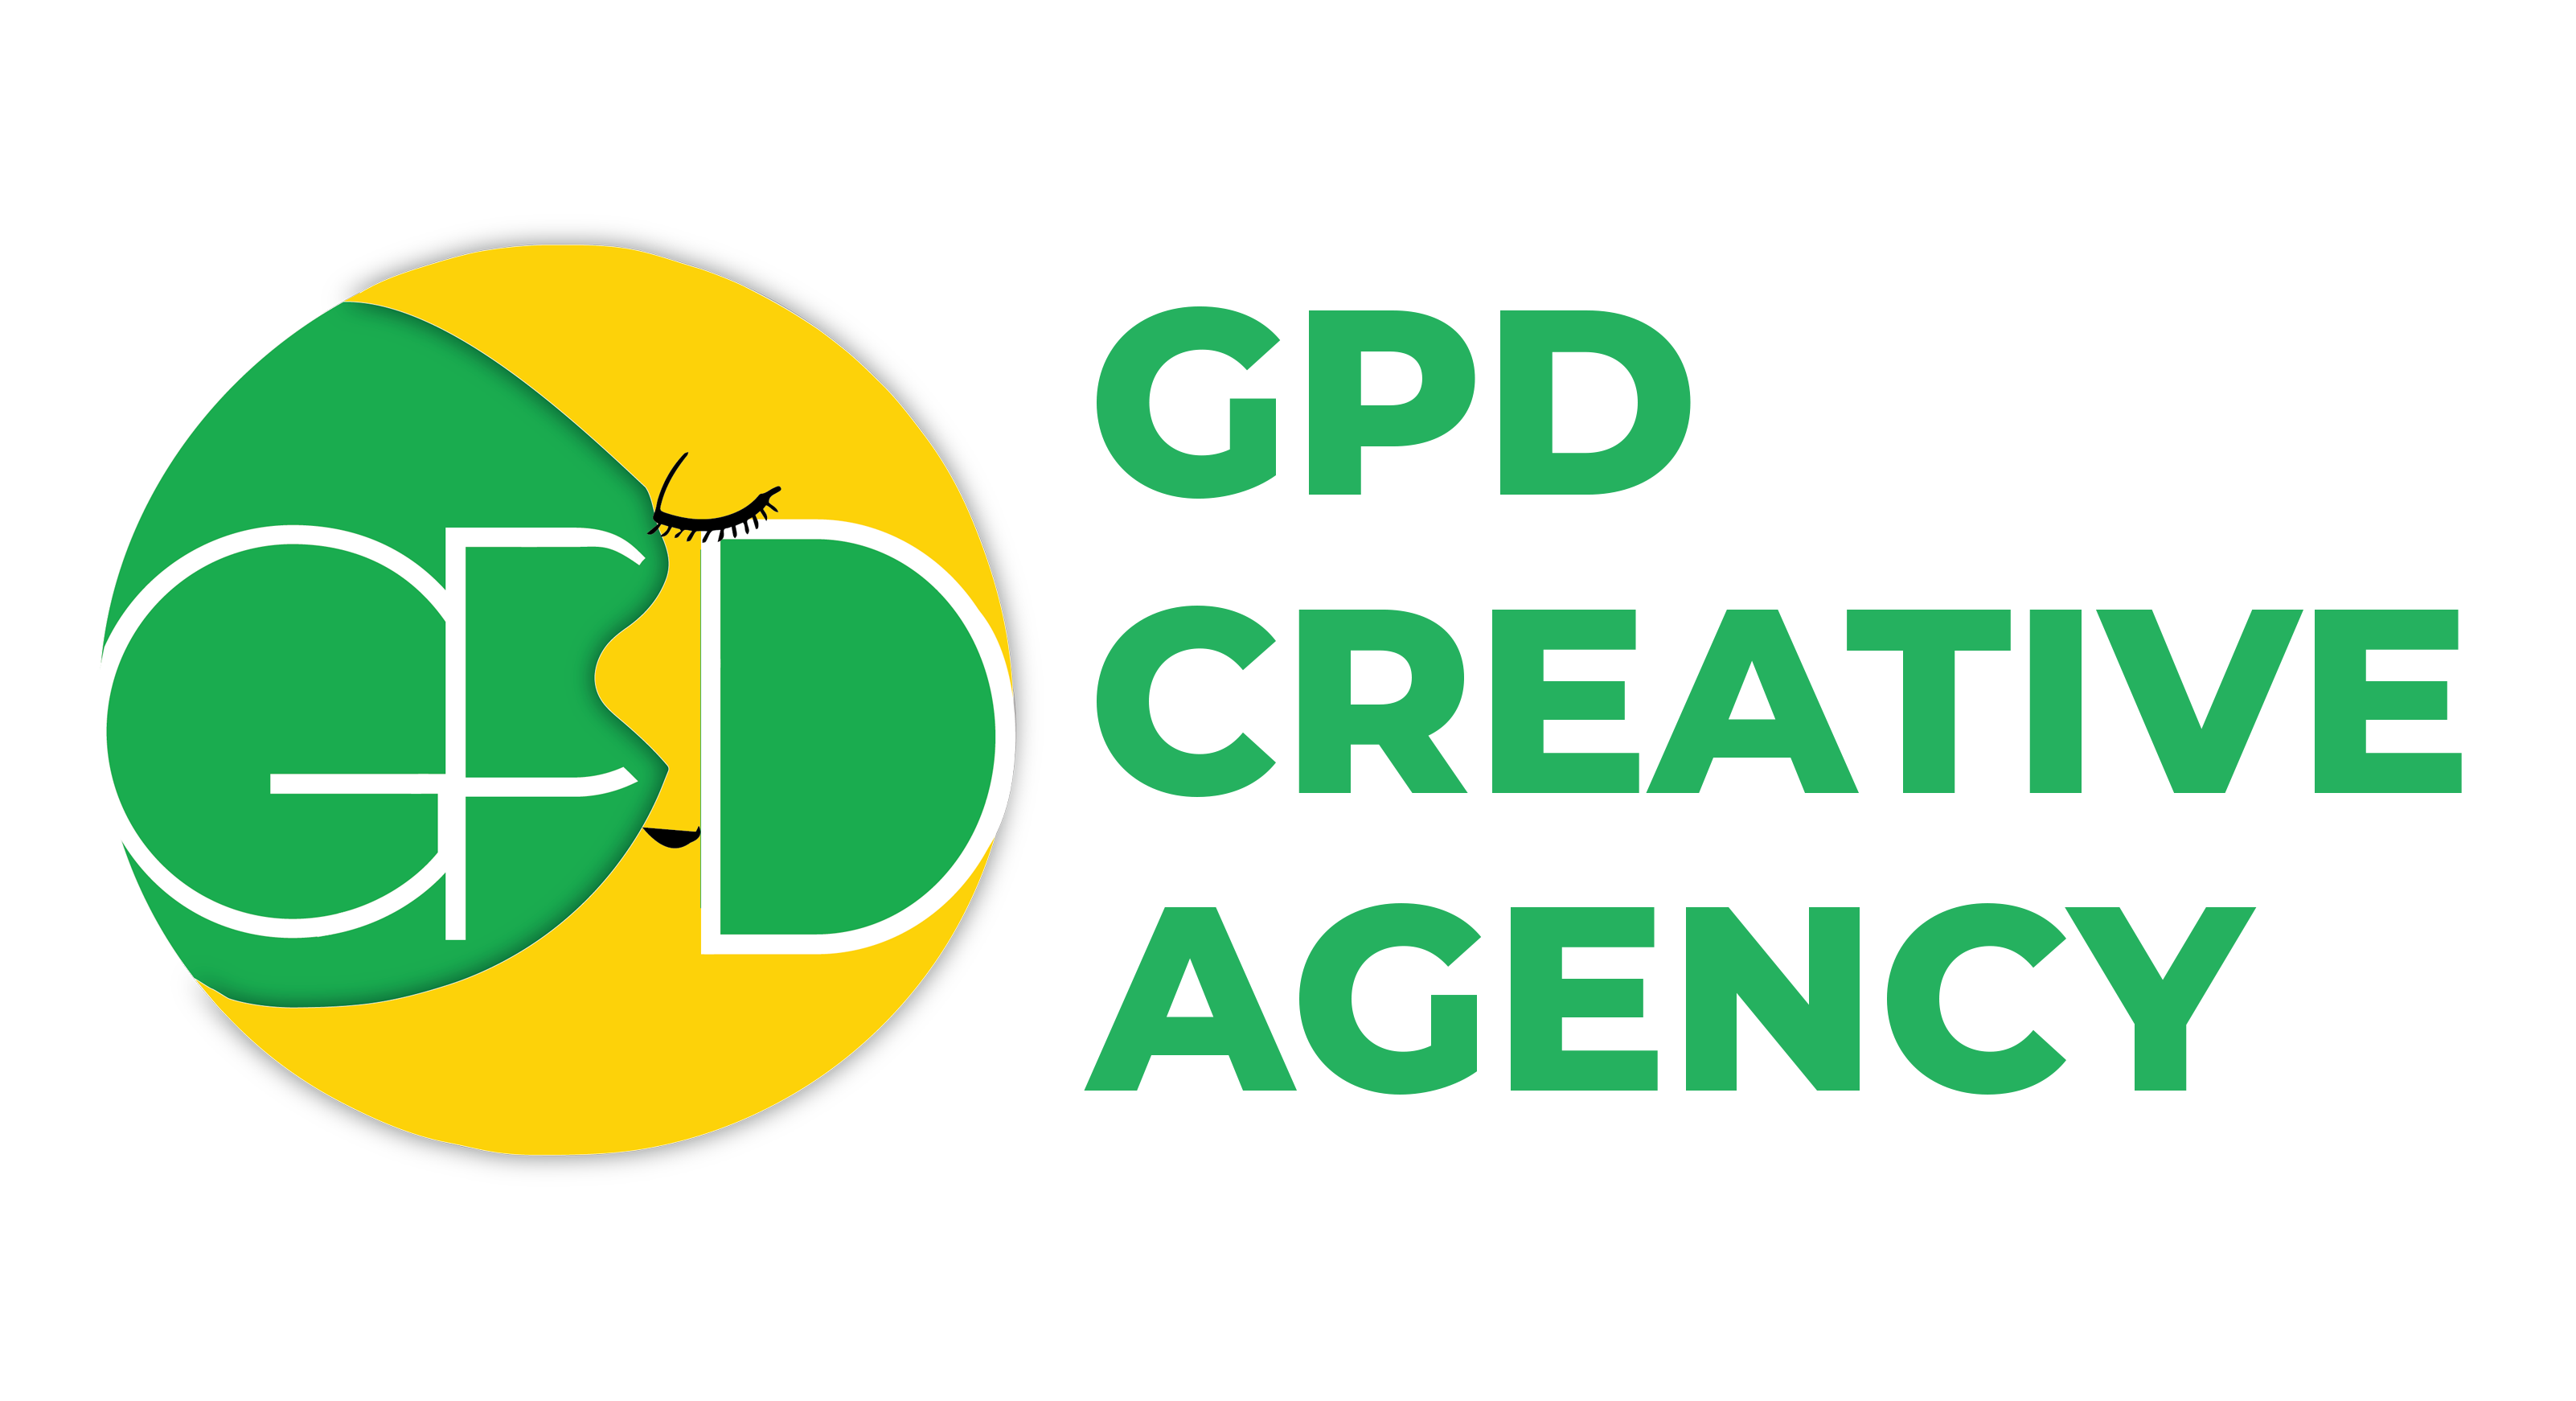 GPD Creative Agency